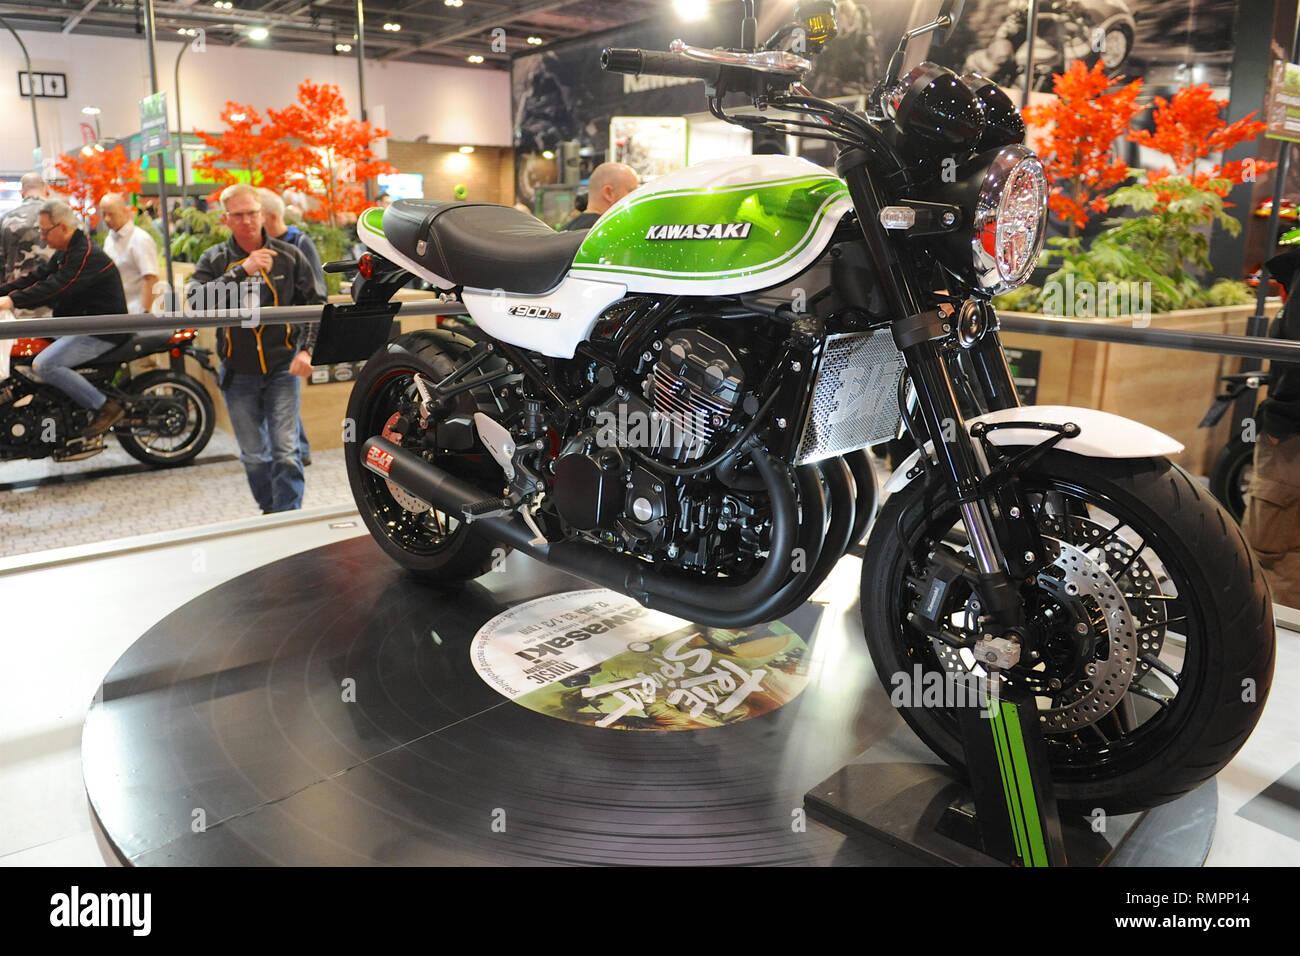 Kawasaki Z900 High Resolution Stock Photography And Images Alamy